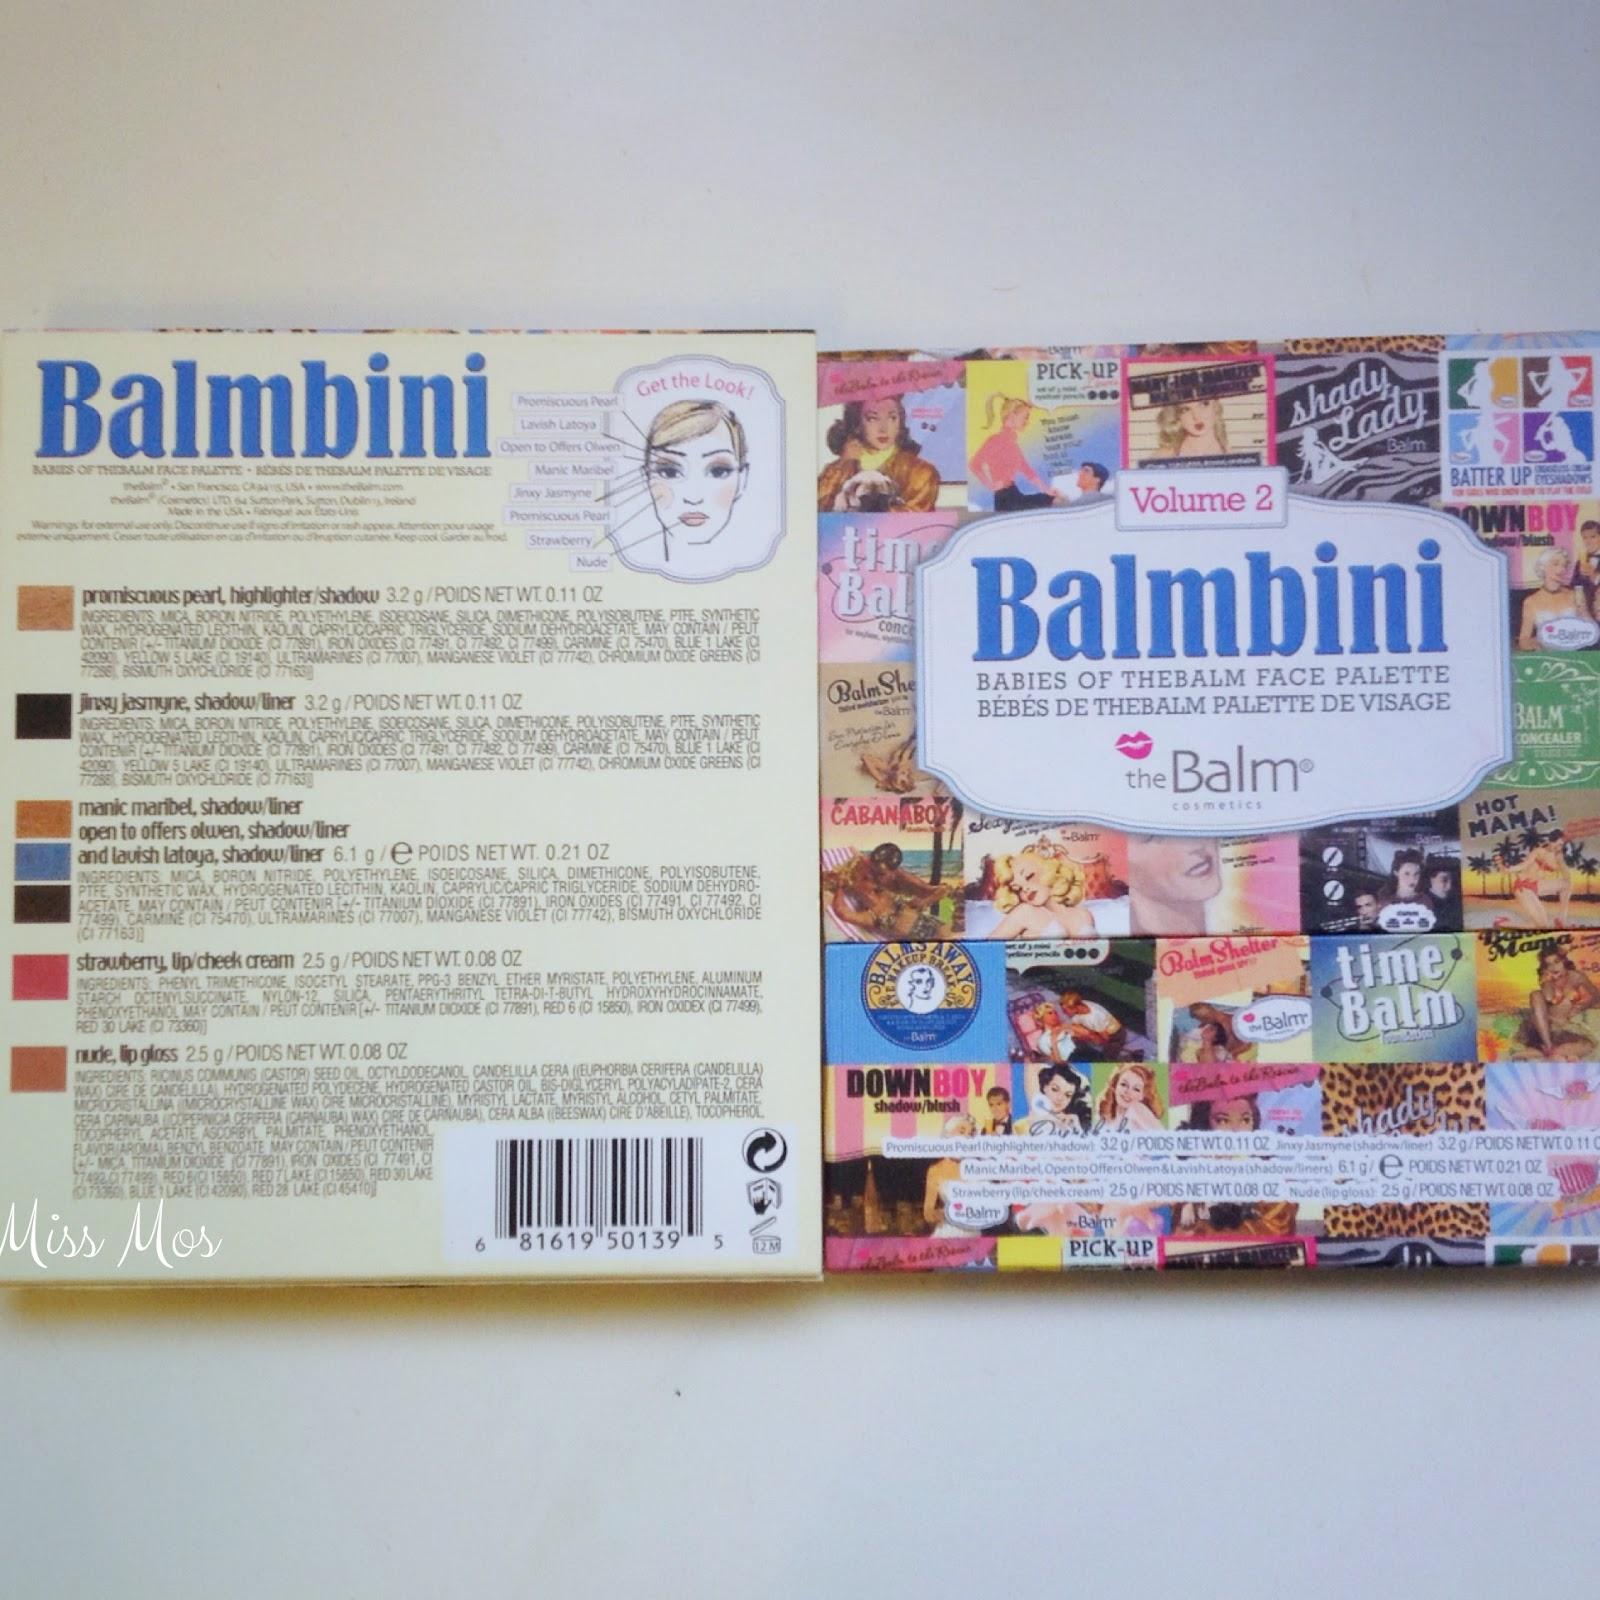 Balmbini volume 2